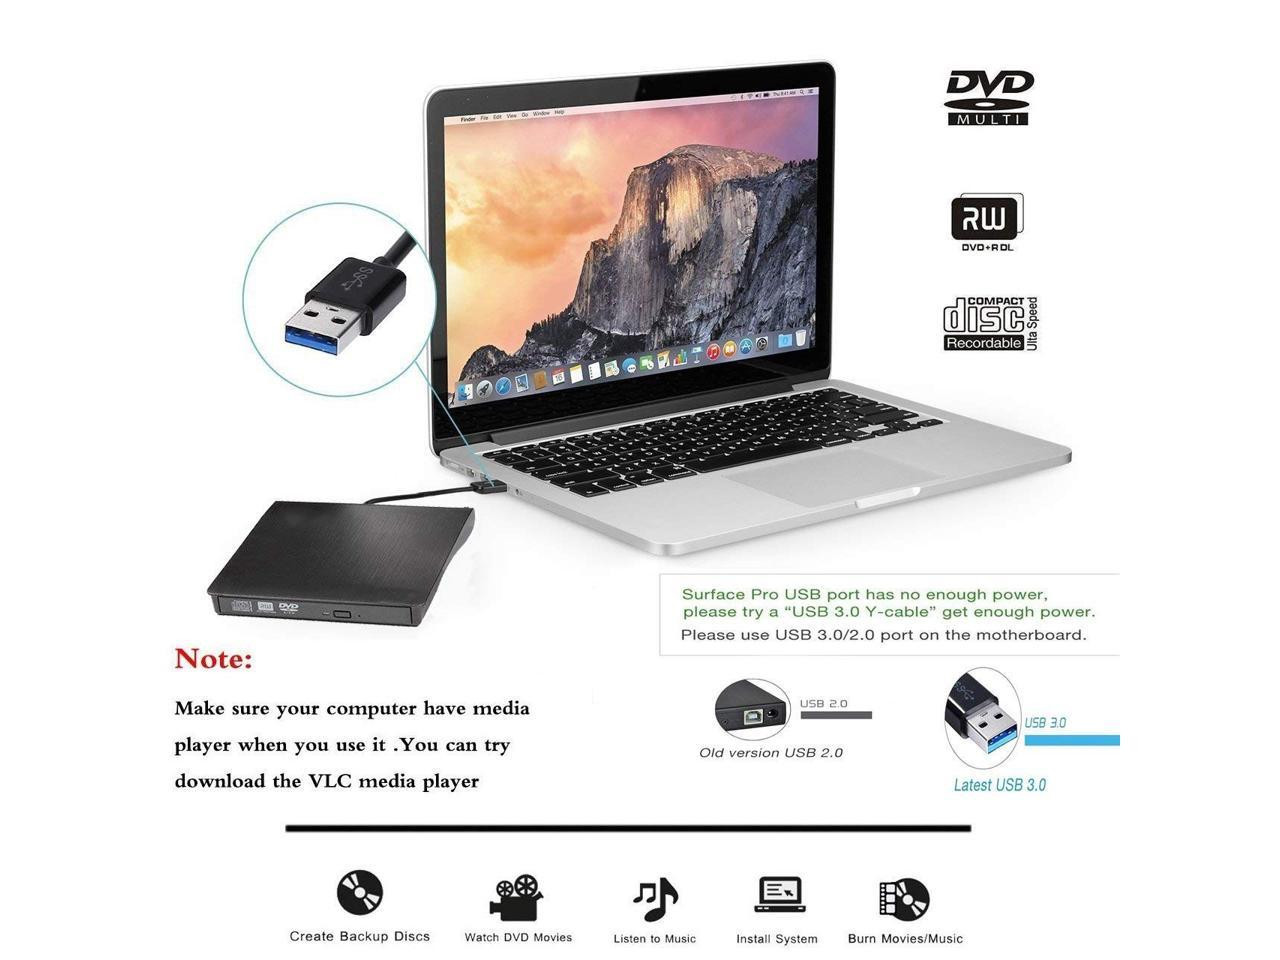 External CD Drive, USB 3.0 Portable CD/DVD +/-RW Drive Slim DVD/CD Rom Rewriter